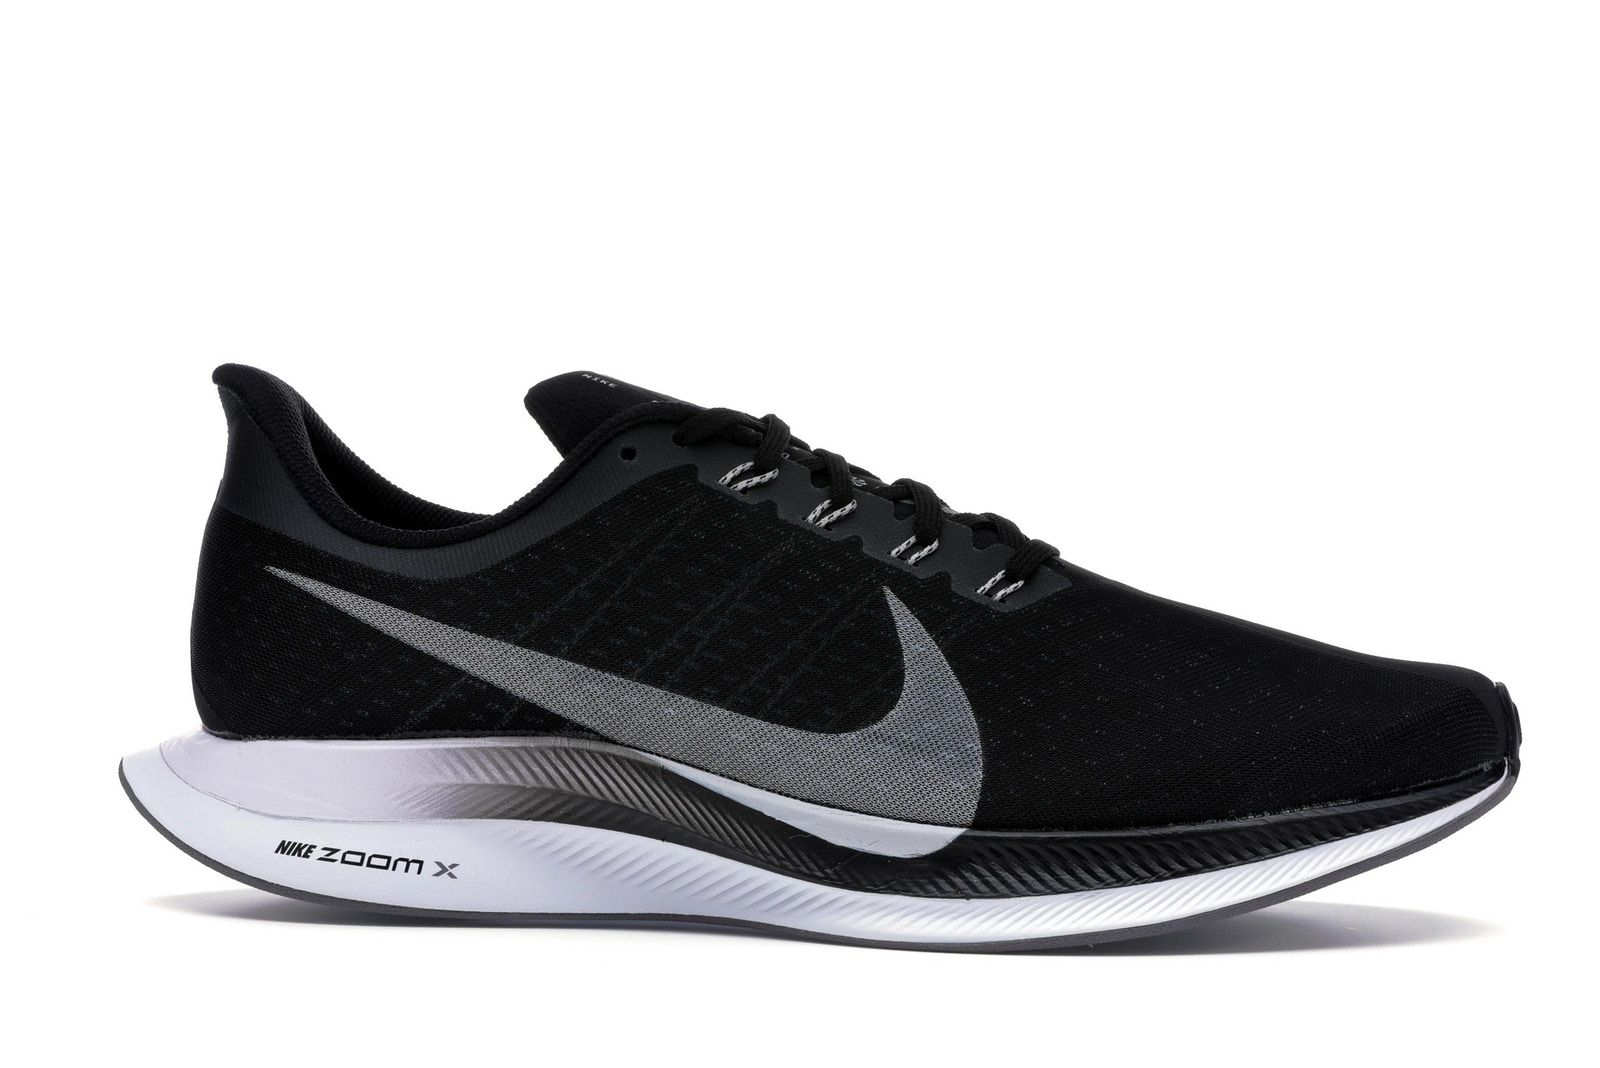 Nike Zoom Pegasus 35 Turbo Black Vast Grey | Zapatillas ...